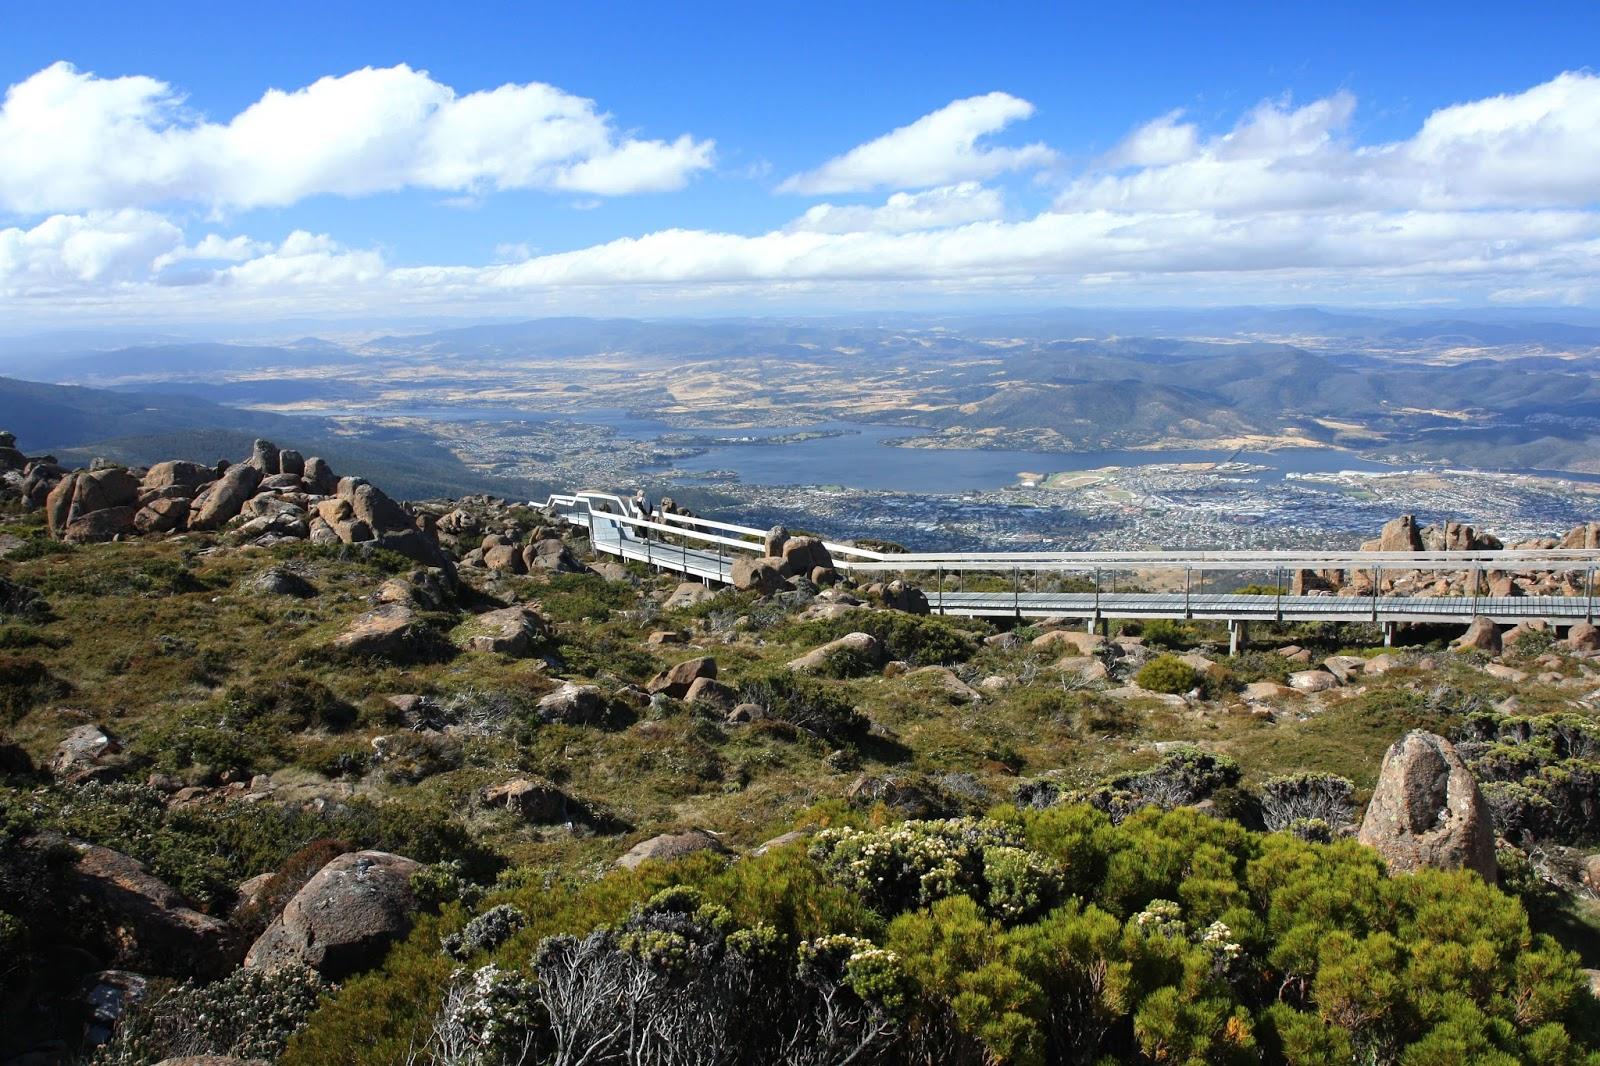 塔斯馬尼亞-景點-推薦-威靈頓山-自由行-旅遊-澳洲-Tasmania-Tourist-Attraction-Mountain-Wellington-Travel-Australia